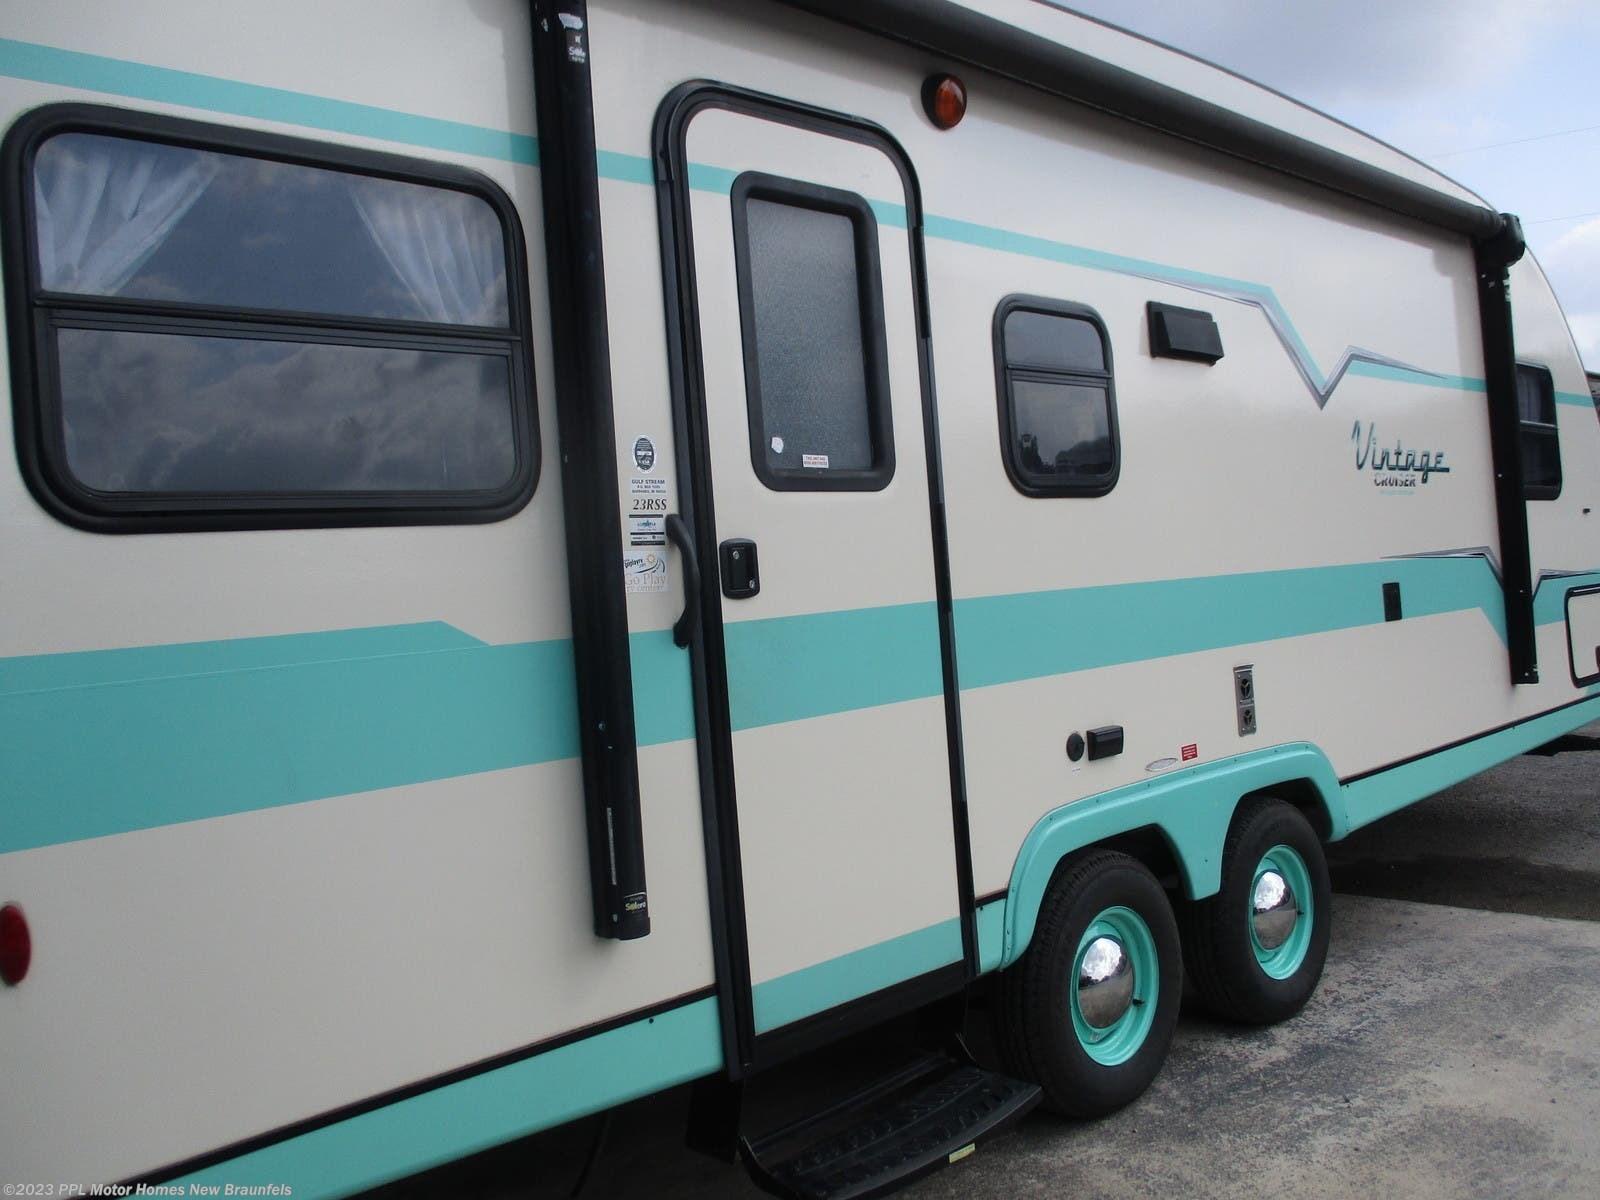 2017 Gulf Stream RV Vintage 23RSS for Sale in New Braunfels, TX 78130 |  T128NB